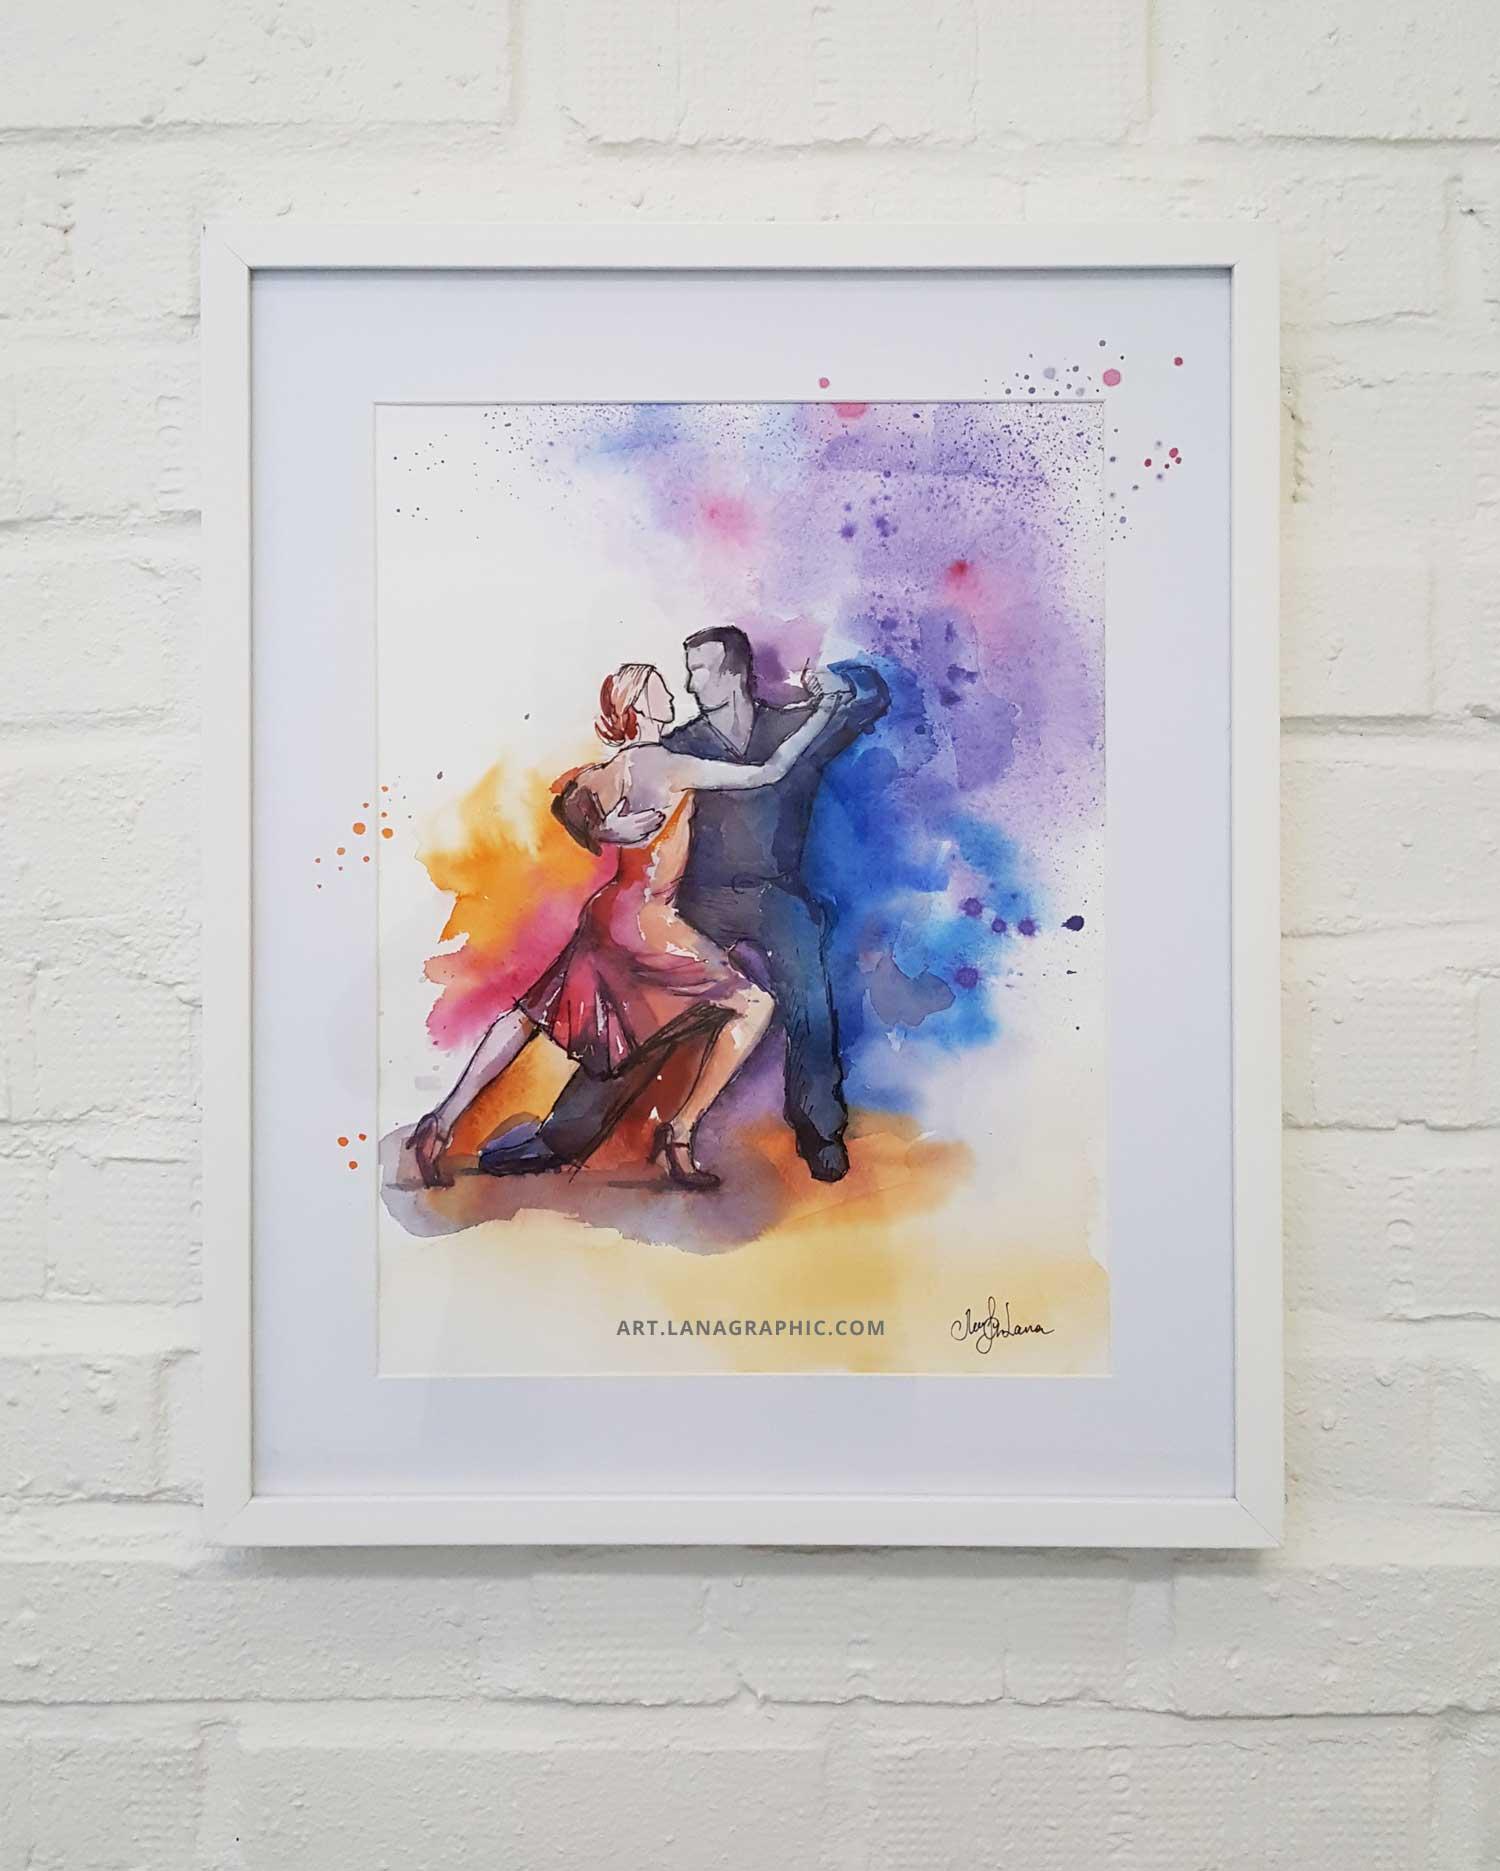 wall-art-Lana-Leuchuk-Let's-dance-2018